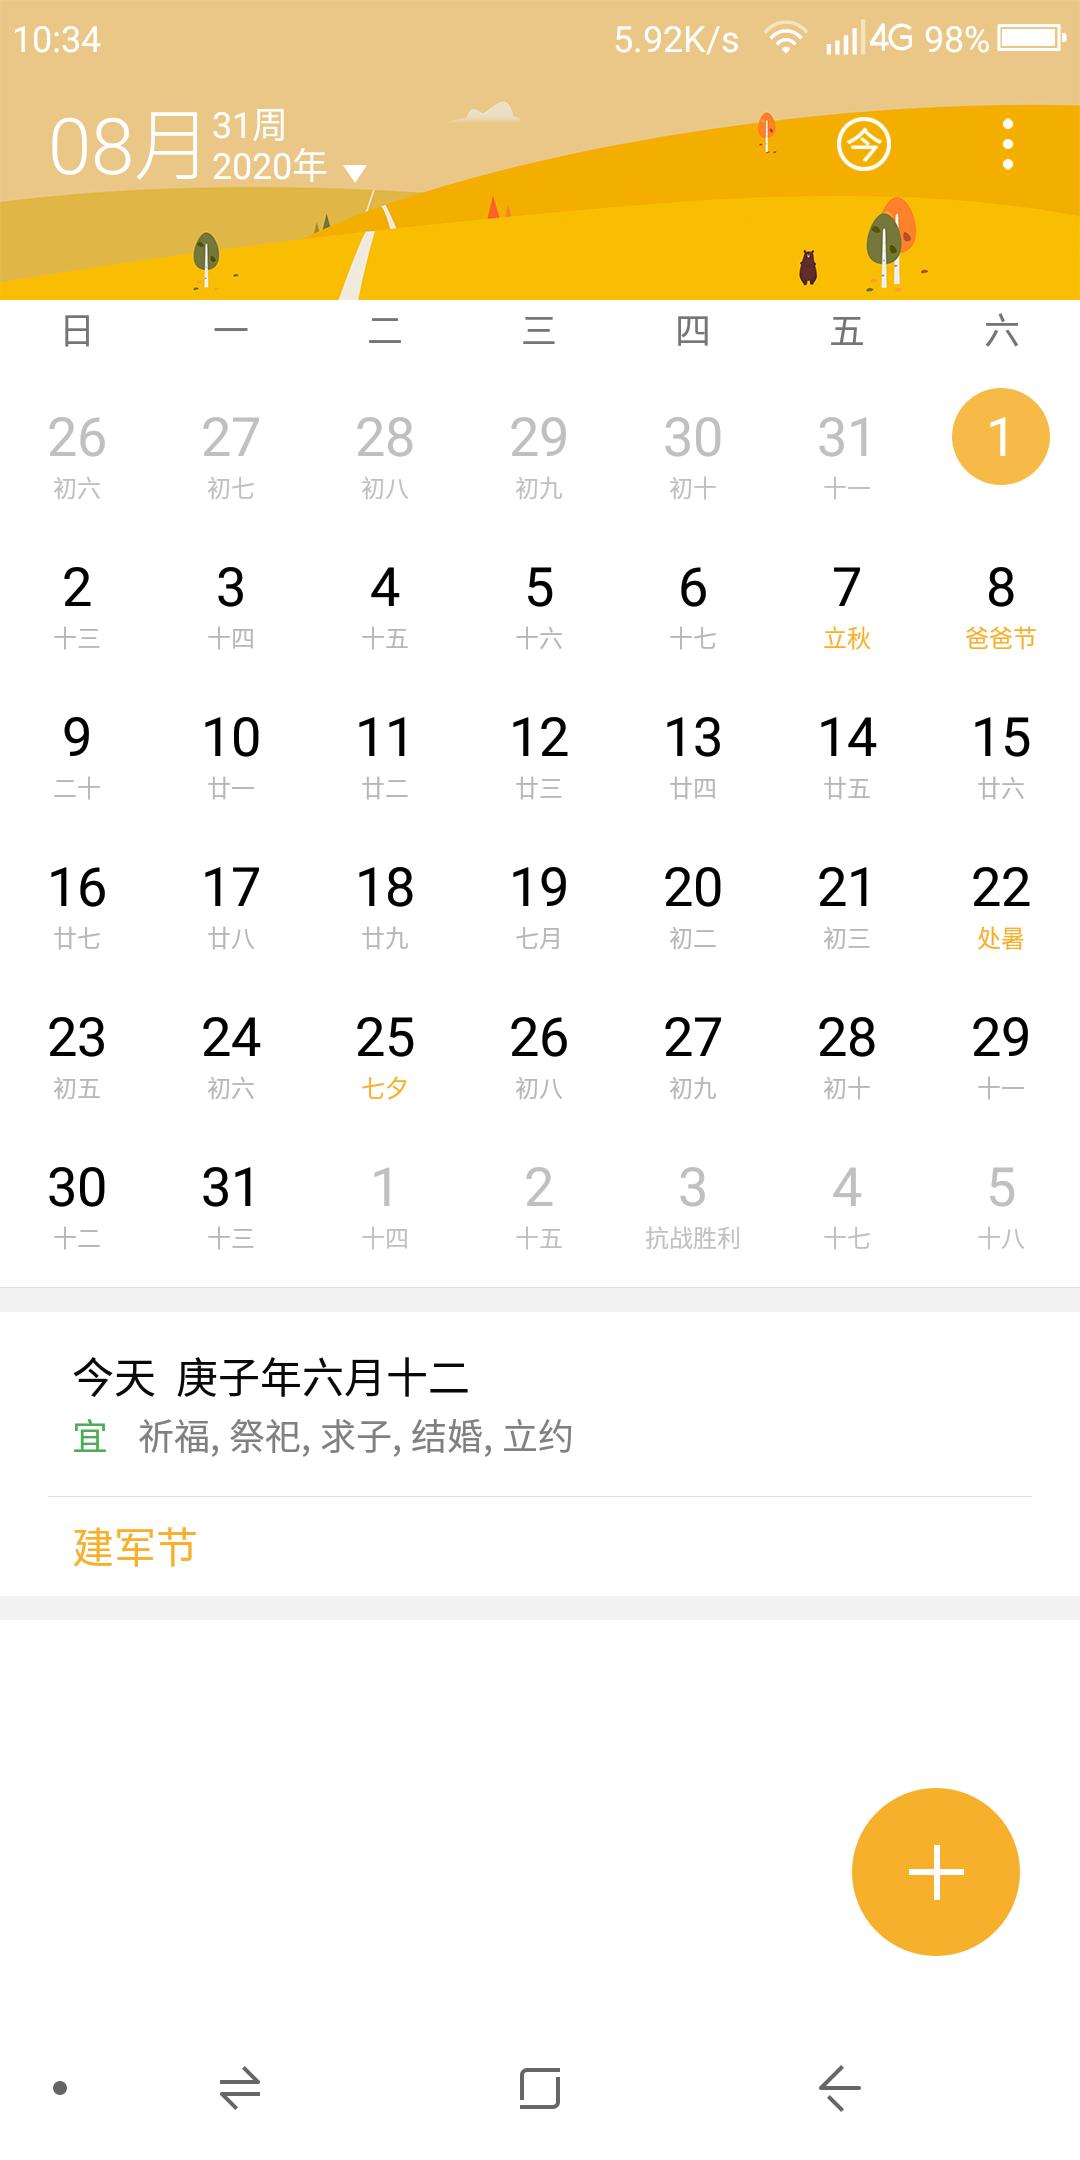 Screenshot_2020-08-01-10-34-27.png